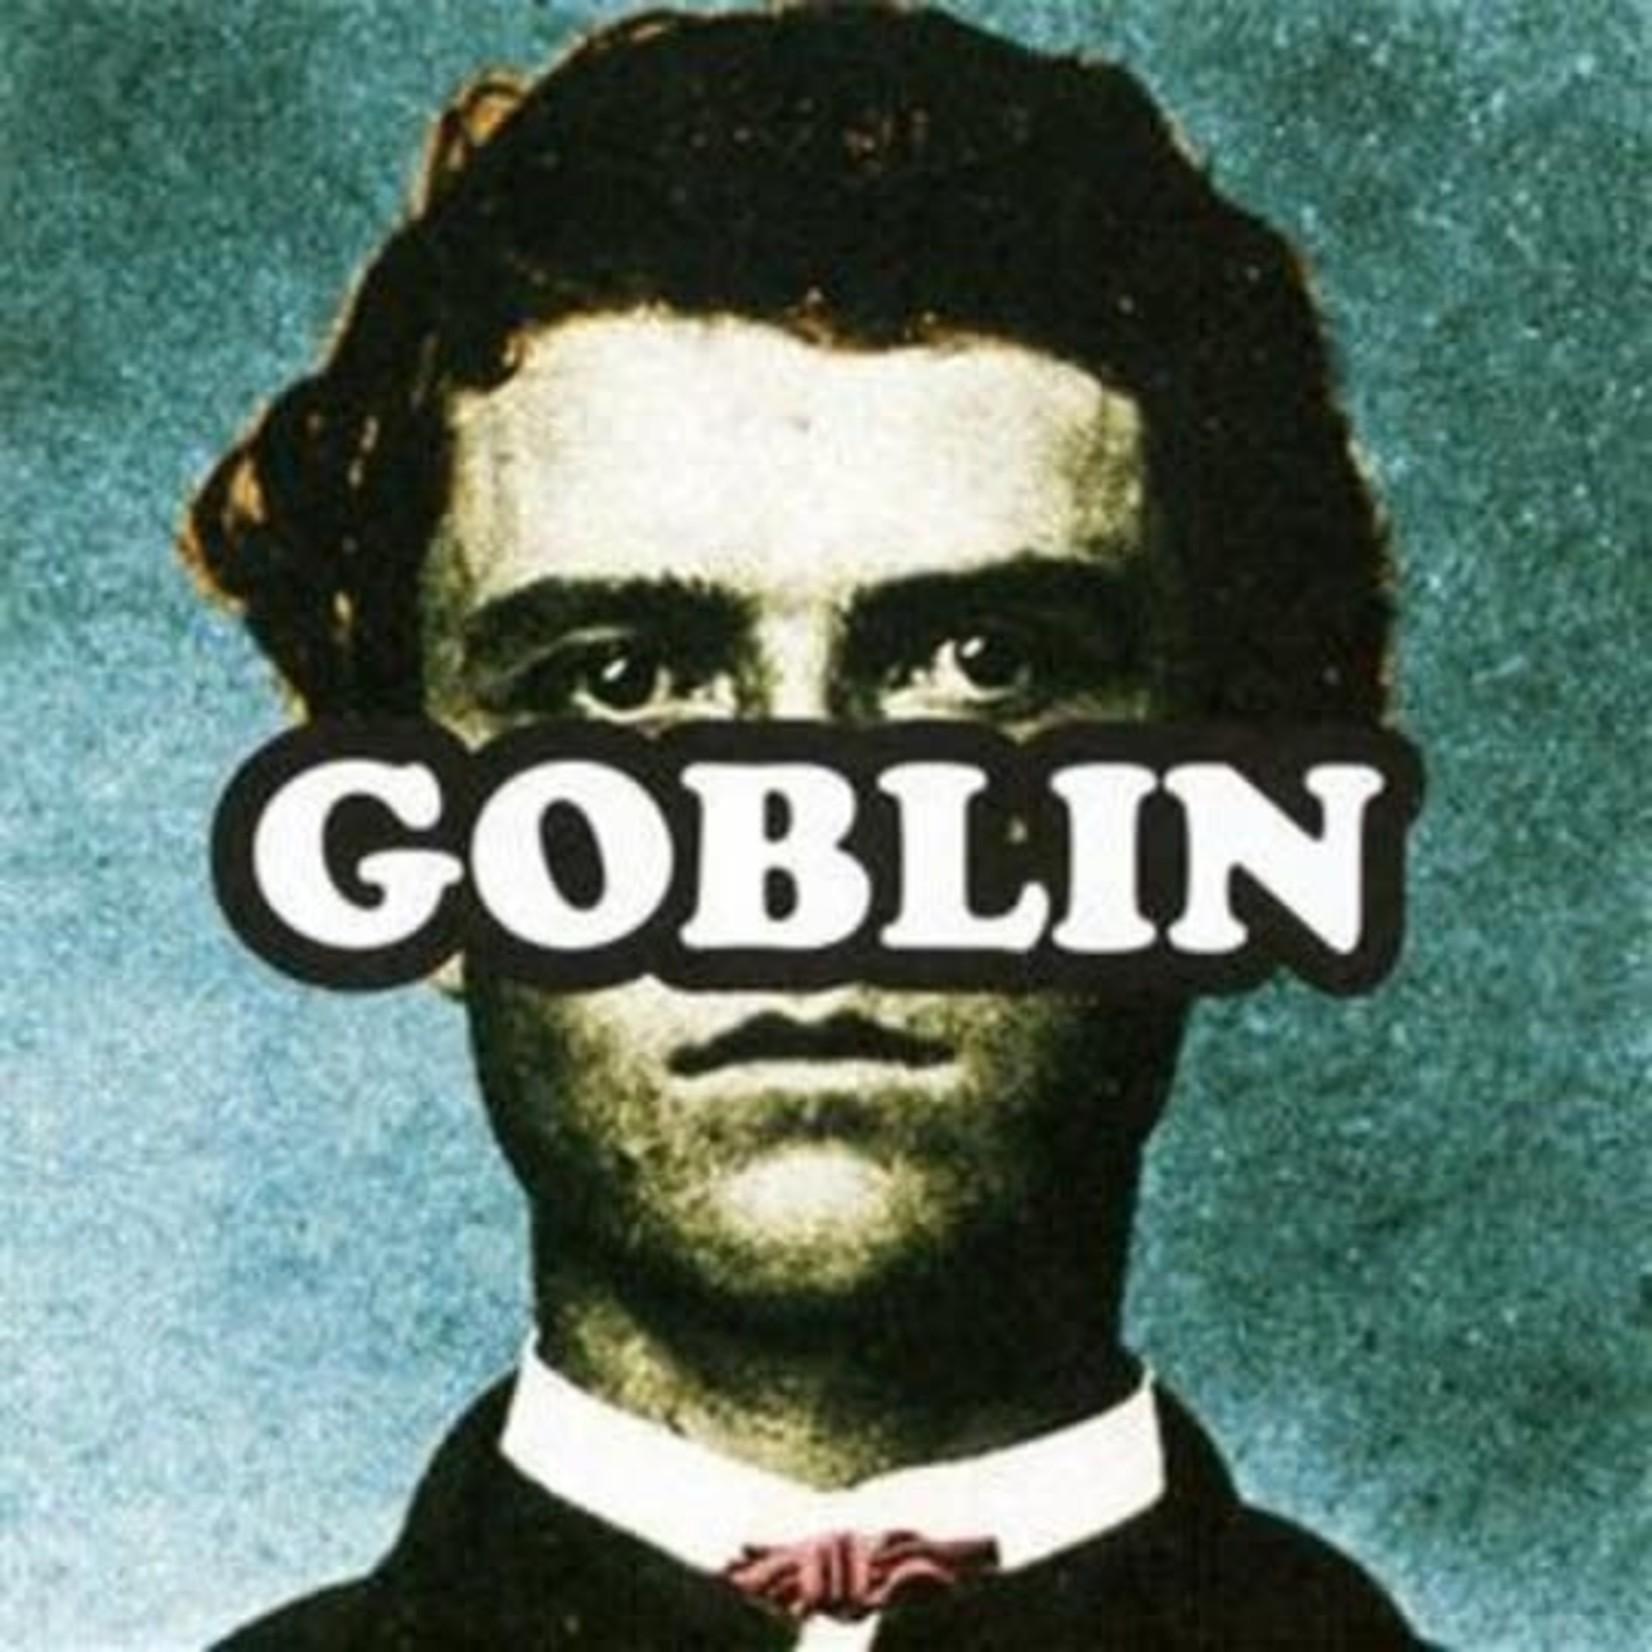 [New] Tyler, The Creator: Goblin (2LP)